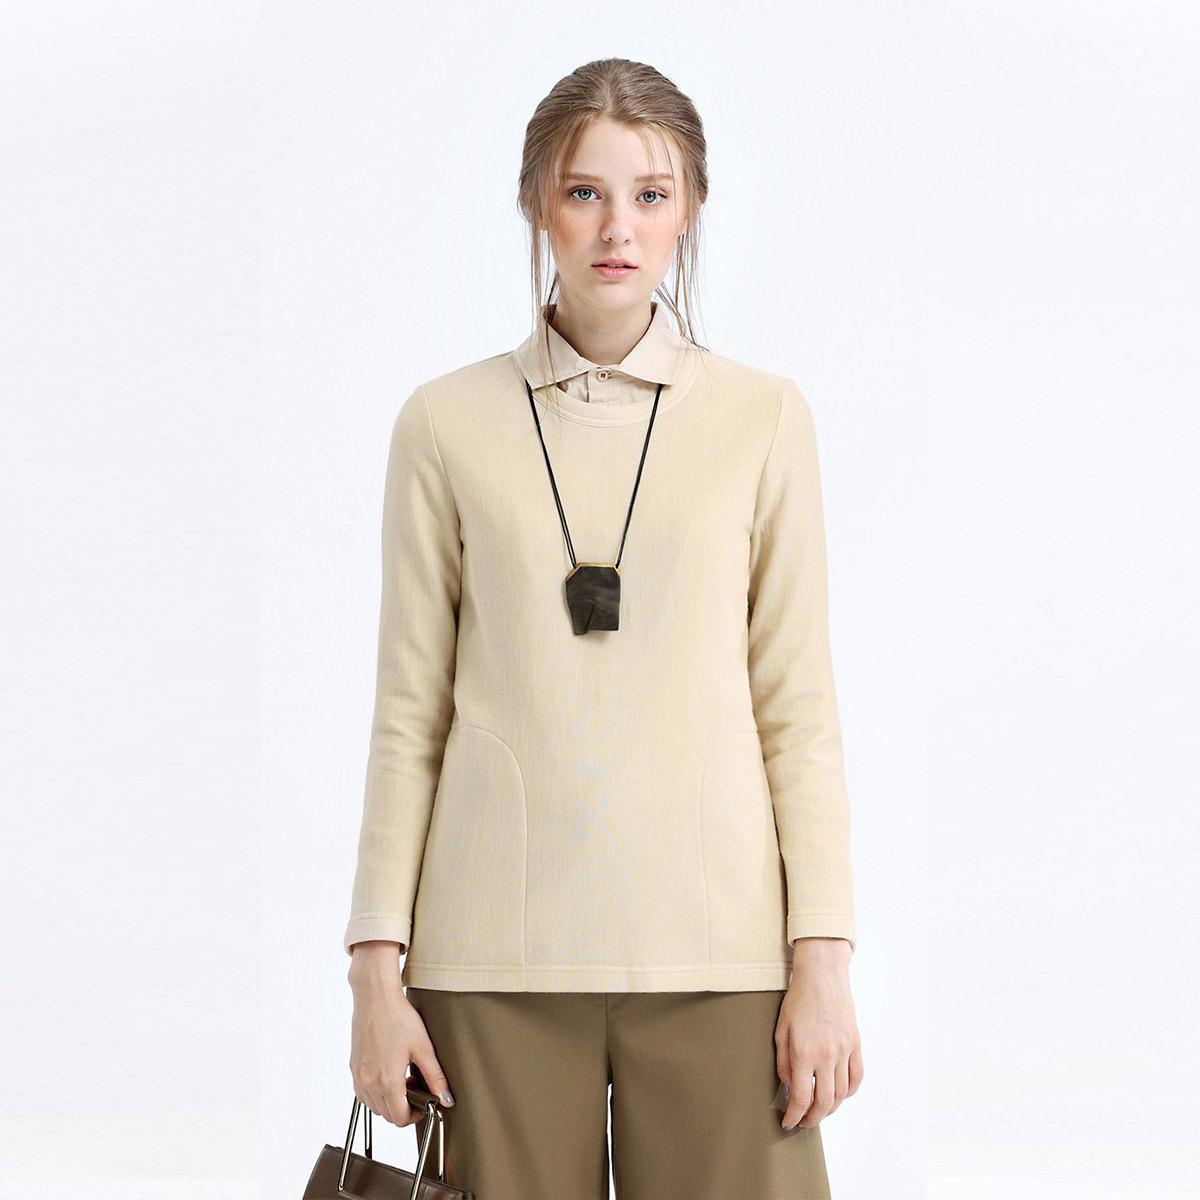 EIN羊毛针织空气层箱型宽松上衣女休闲长袖恤秋装新款EIN言EI0103831200